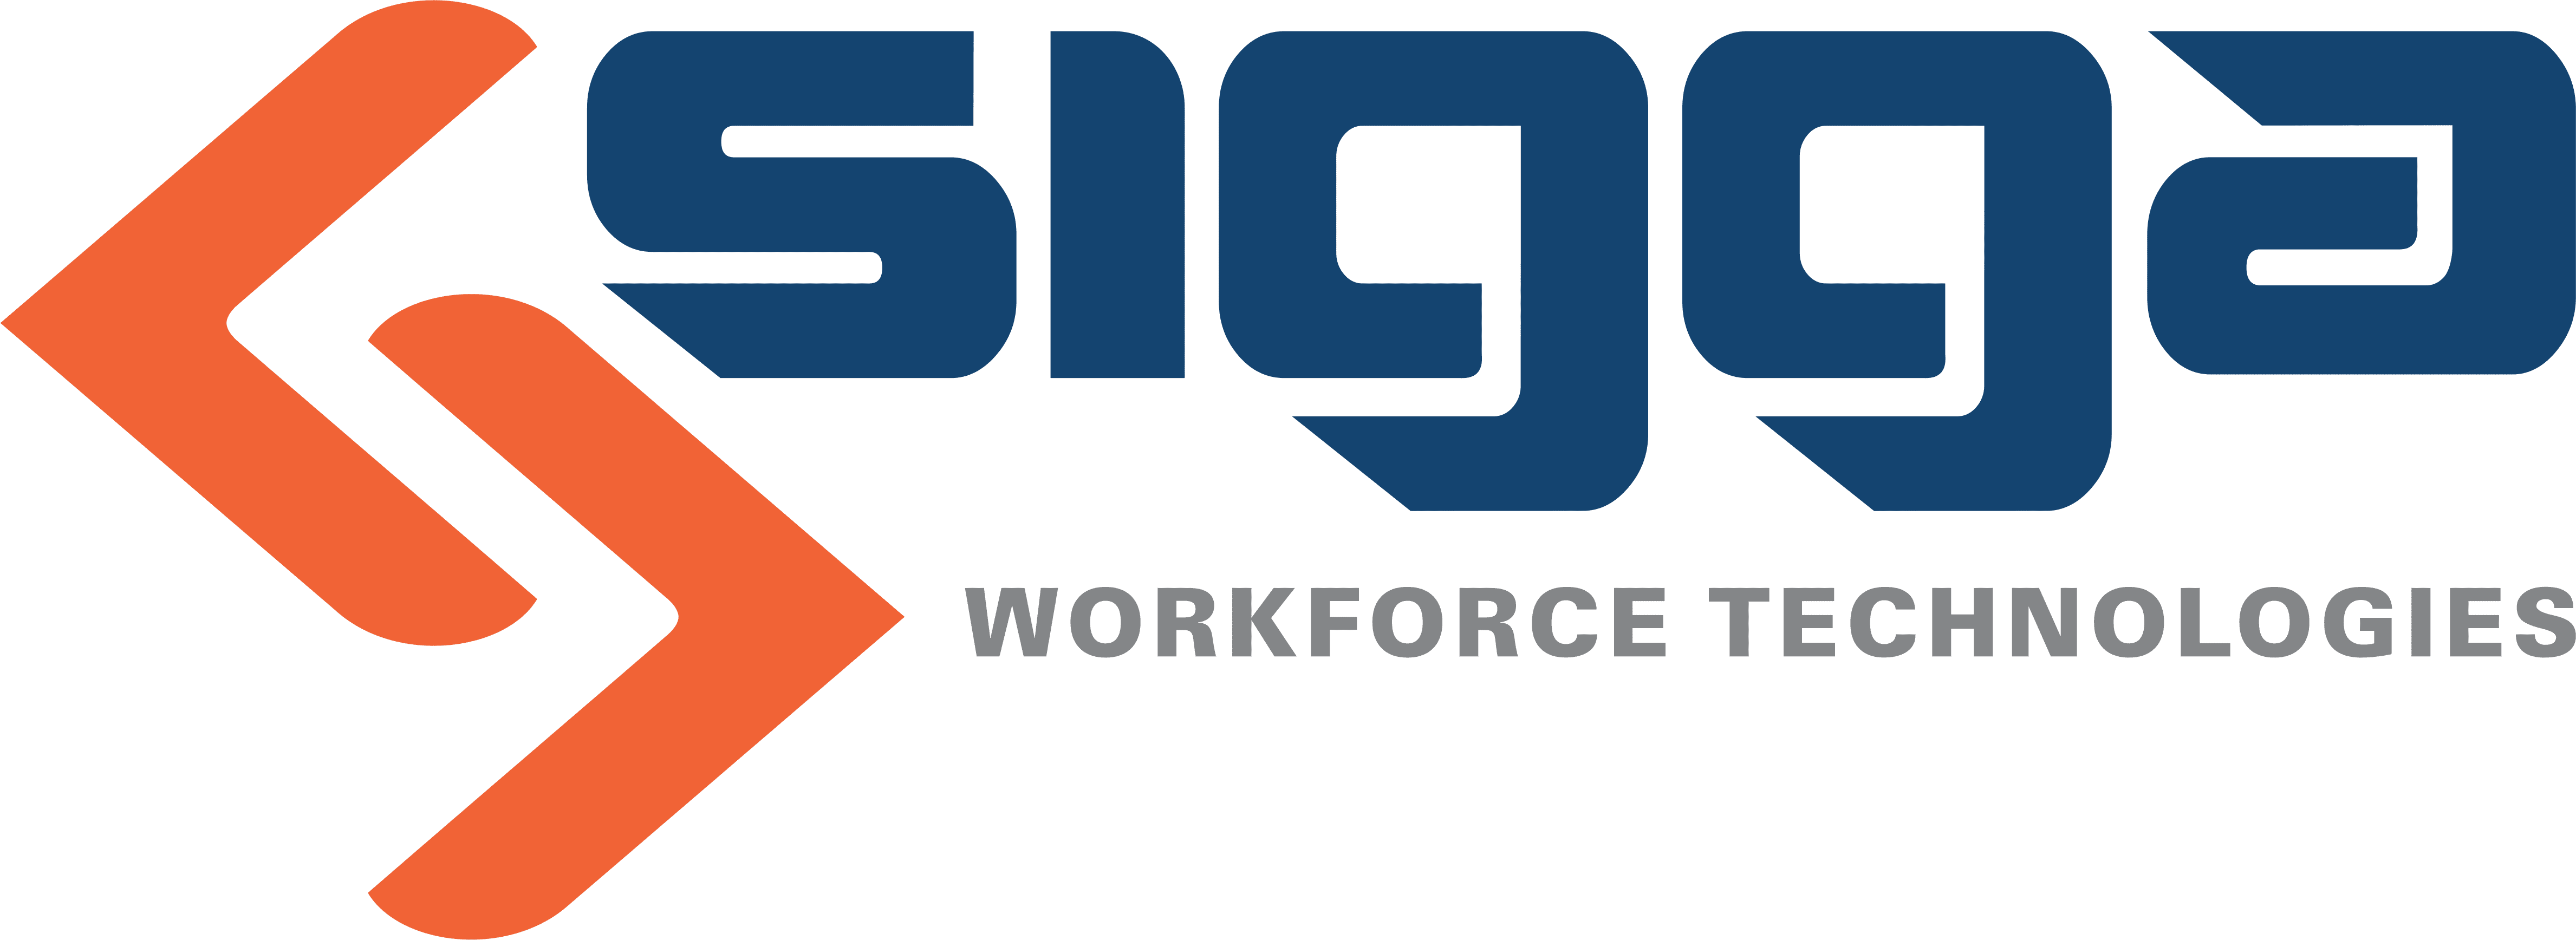 Logoo_Sigga_WORKFORCE-TECHNOLOGIES-1